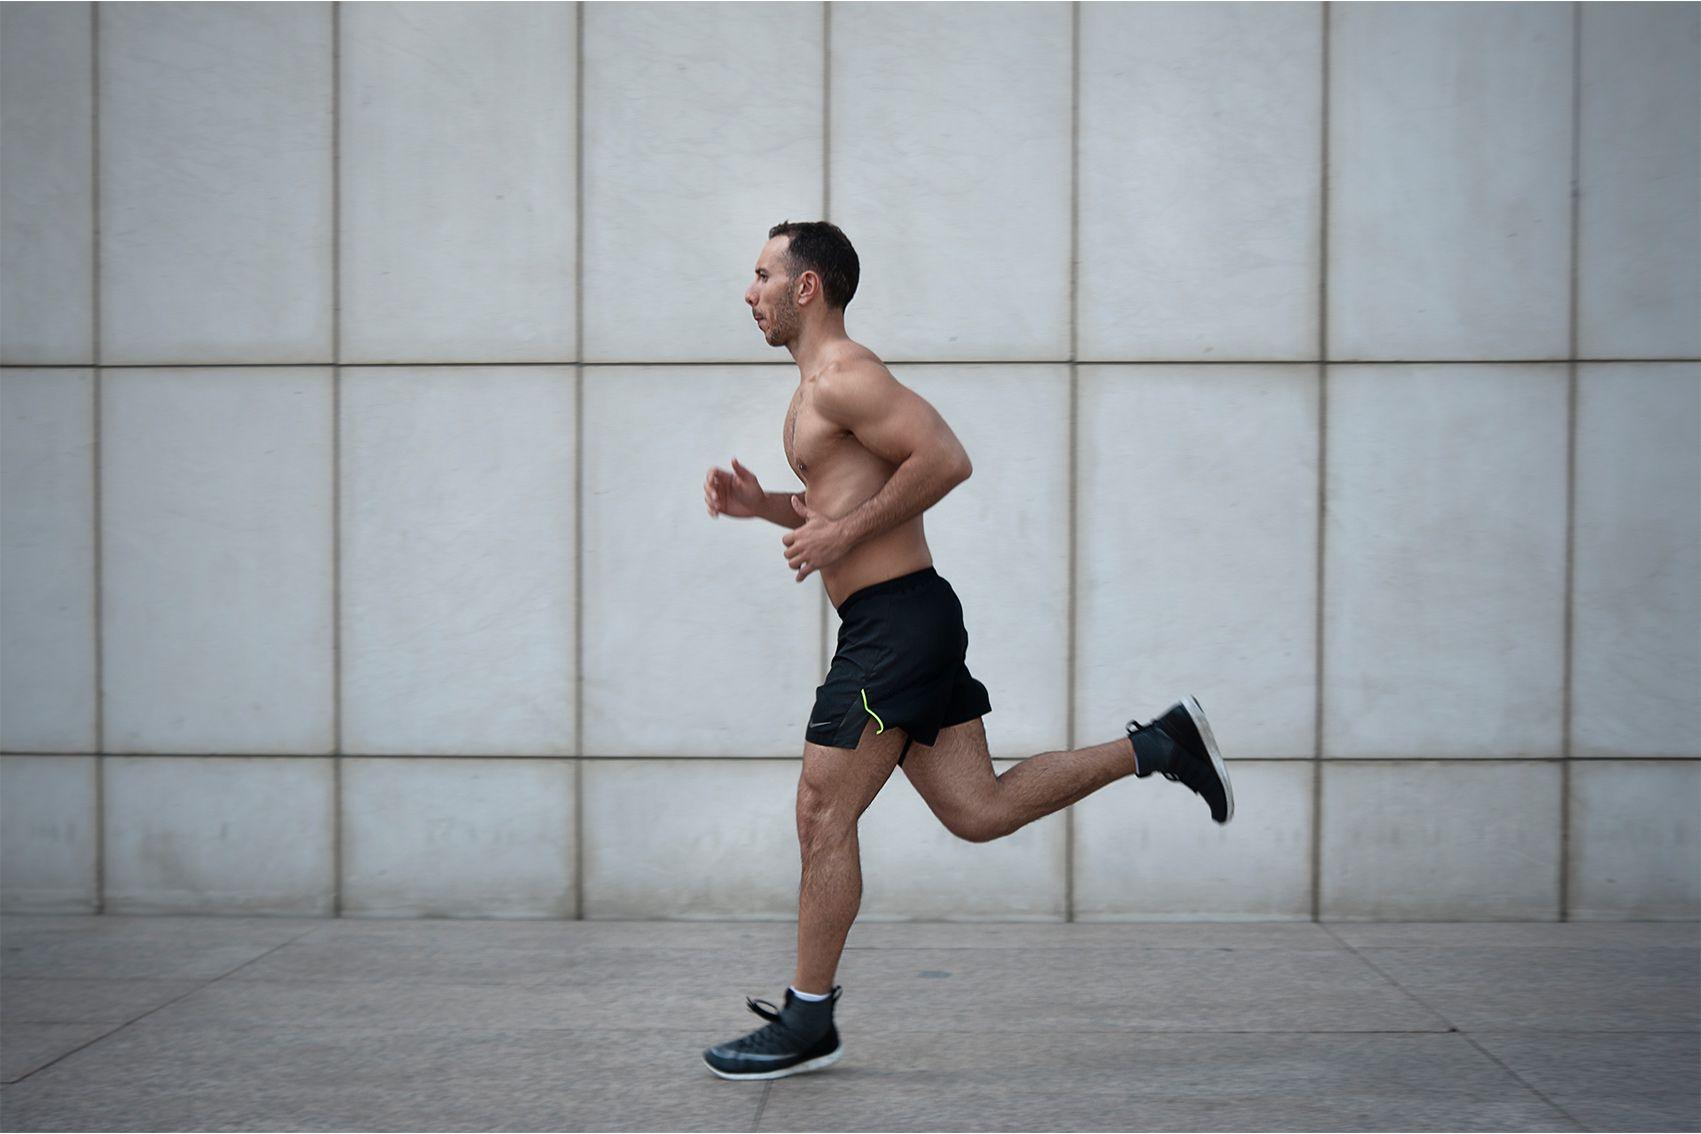 ¿Vas a correr la San Silvestre? ¡Prepárate!